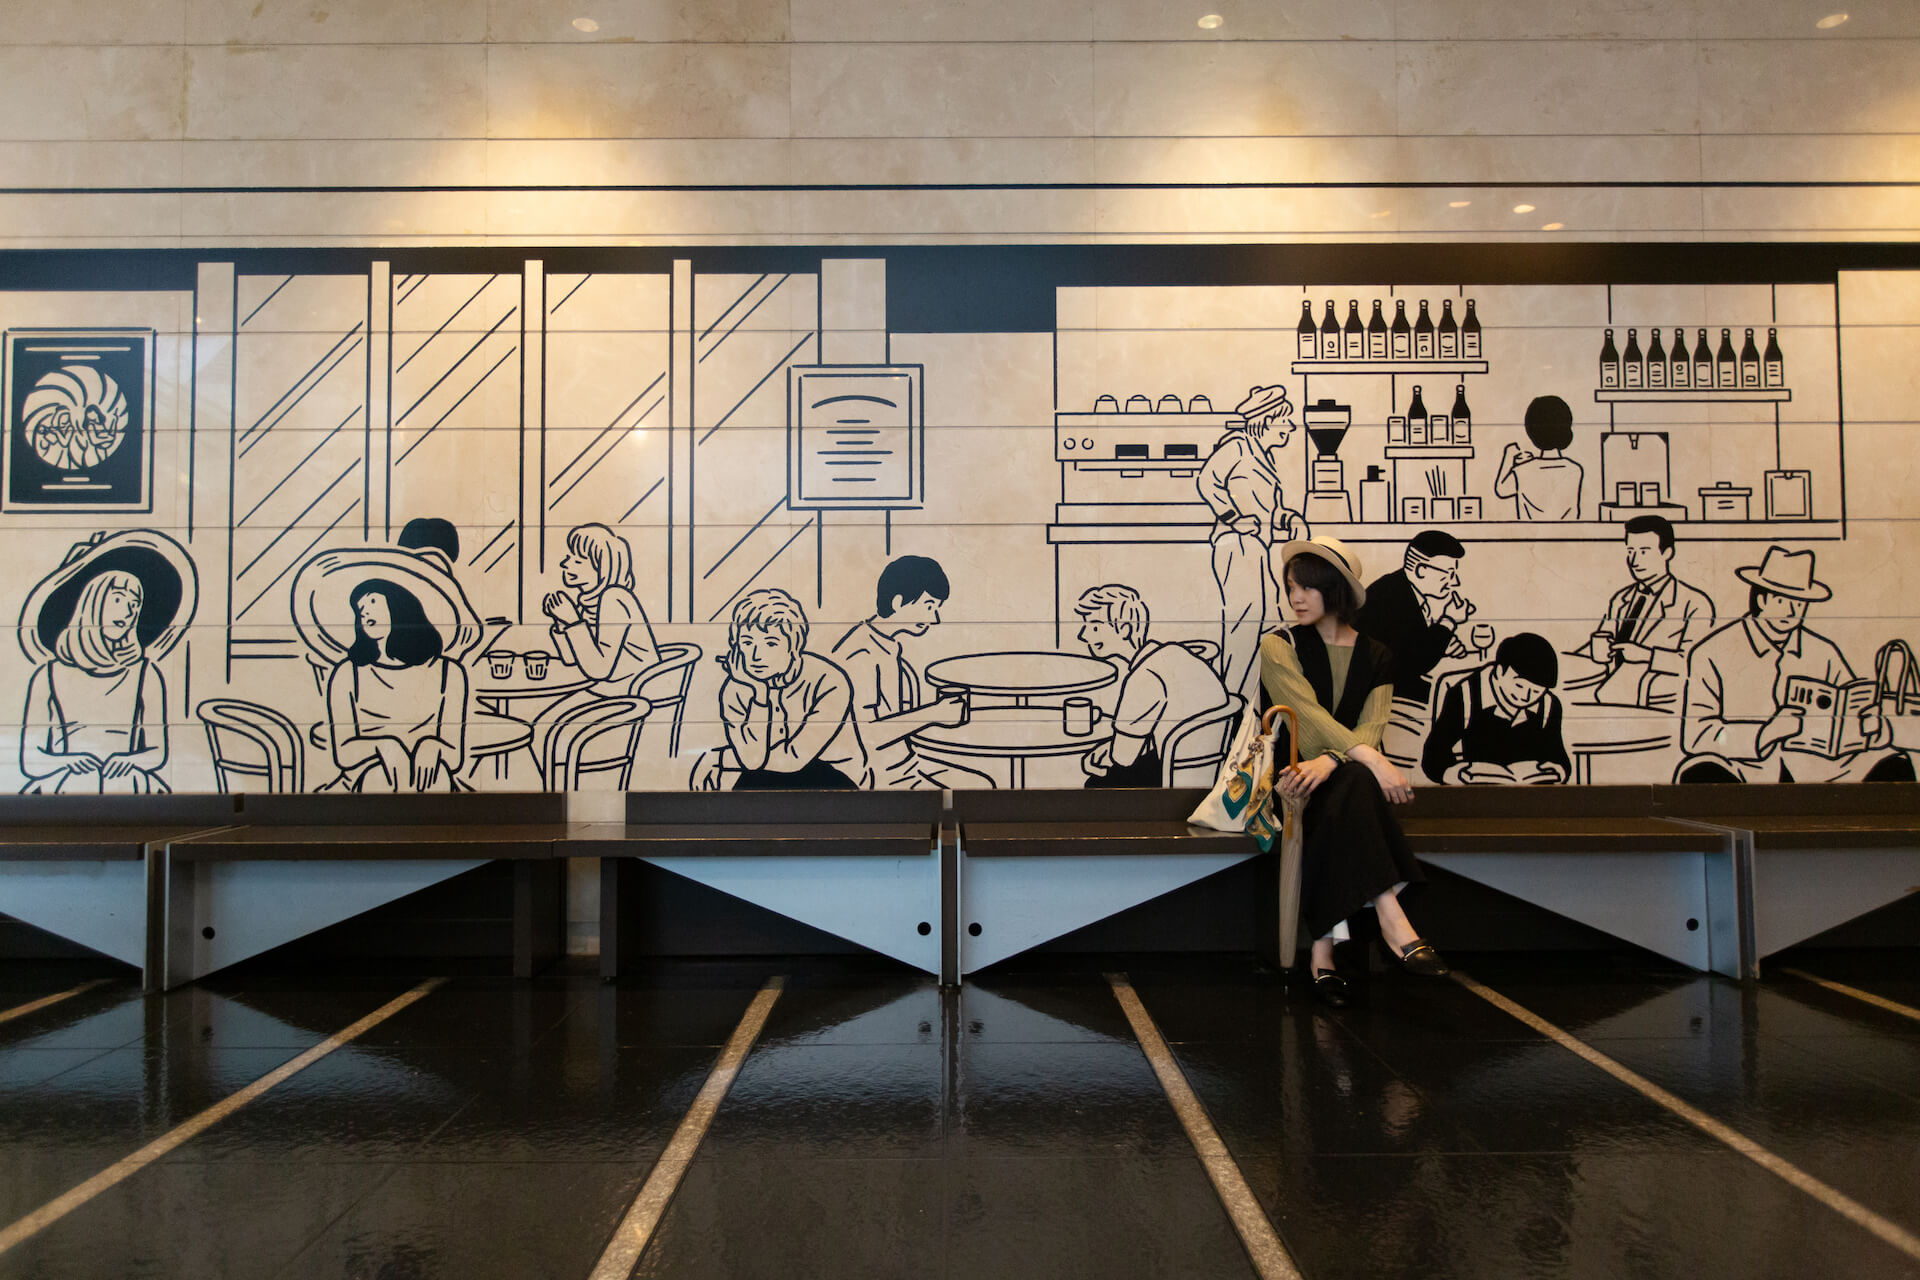 Bunkamuraで、パリを訪れた気分に ー MAPP_ × 伊藤敦志 『PLAYTIME』に込めた想い interview210715_mapp-ito-atsushi-04